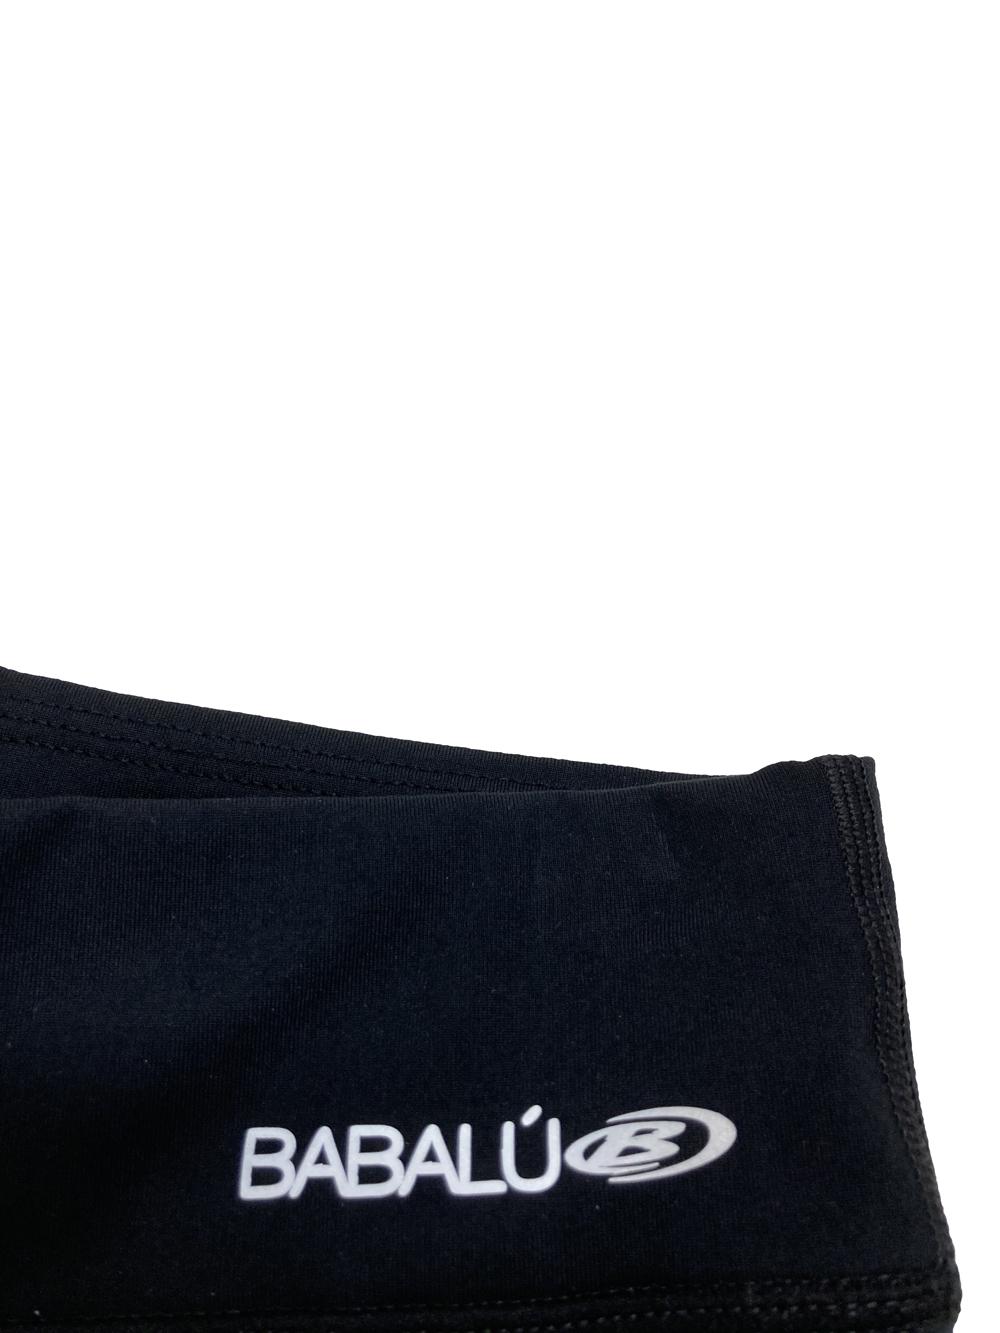 BABALU SUPPLEX FABRIC LEGGINS